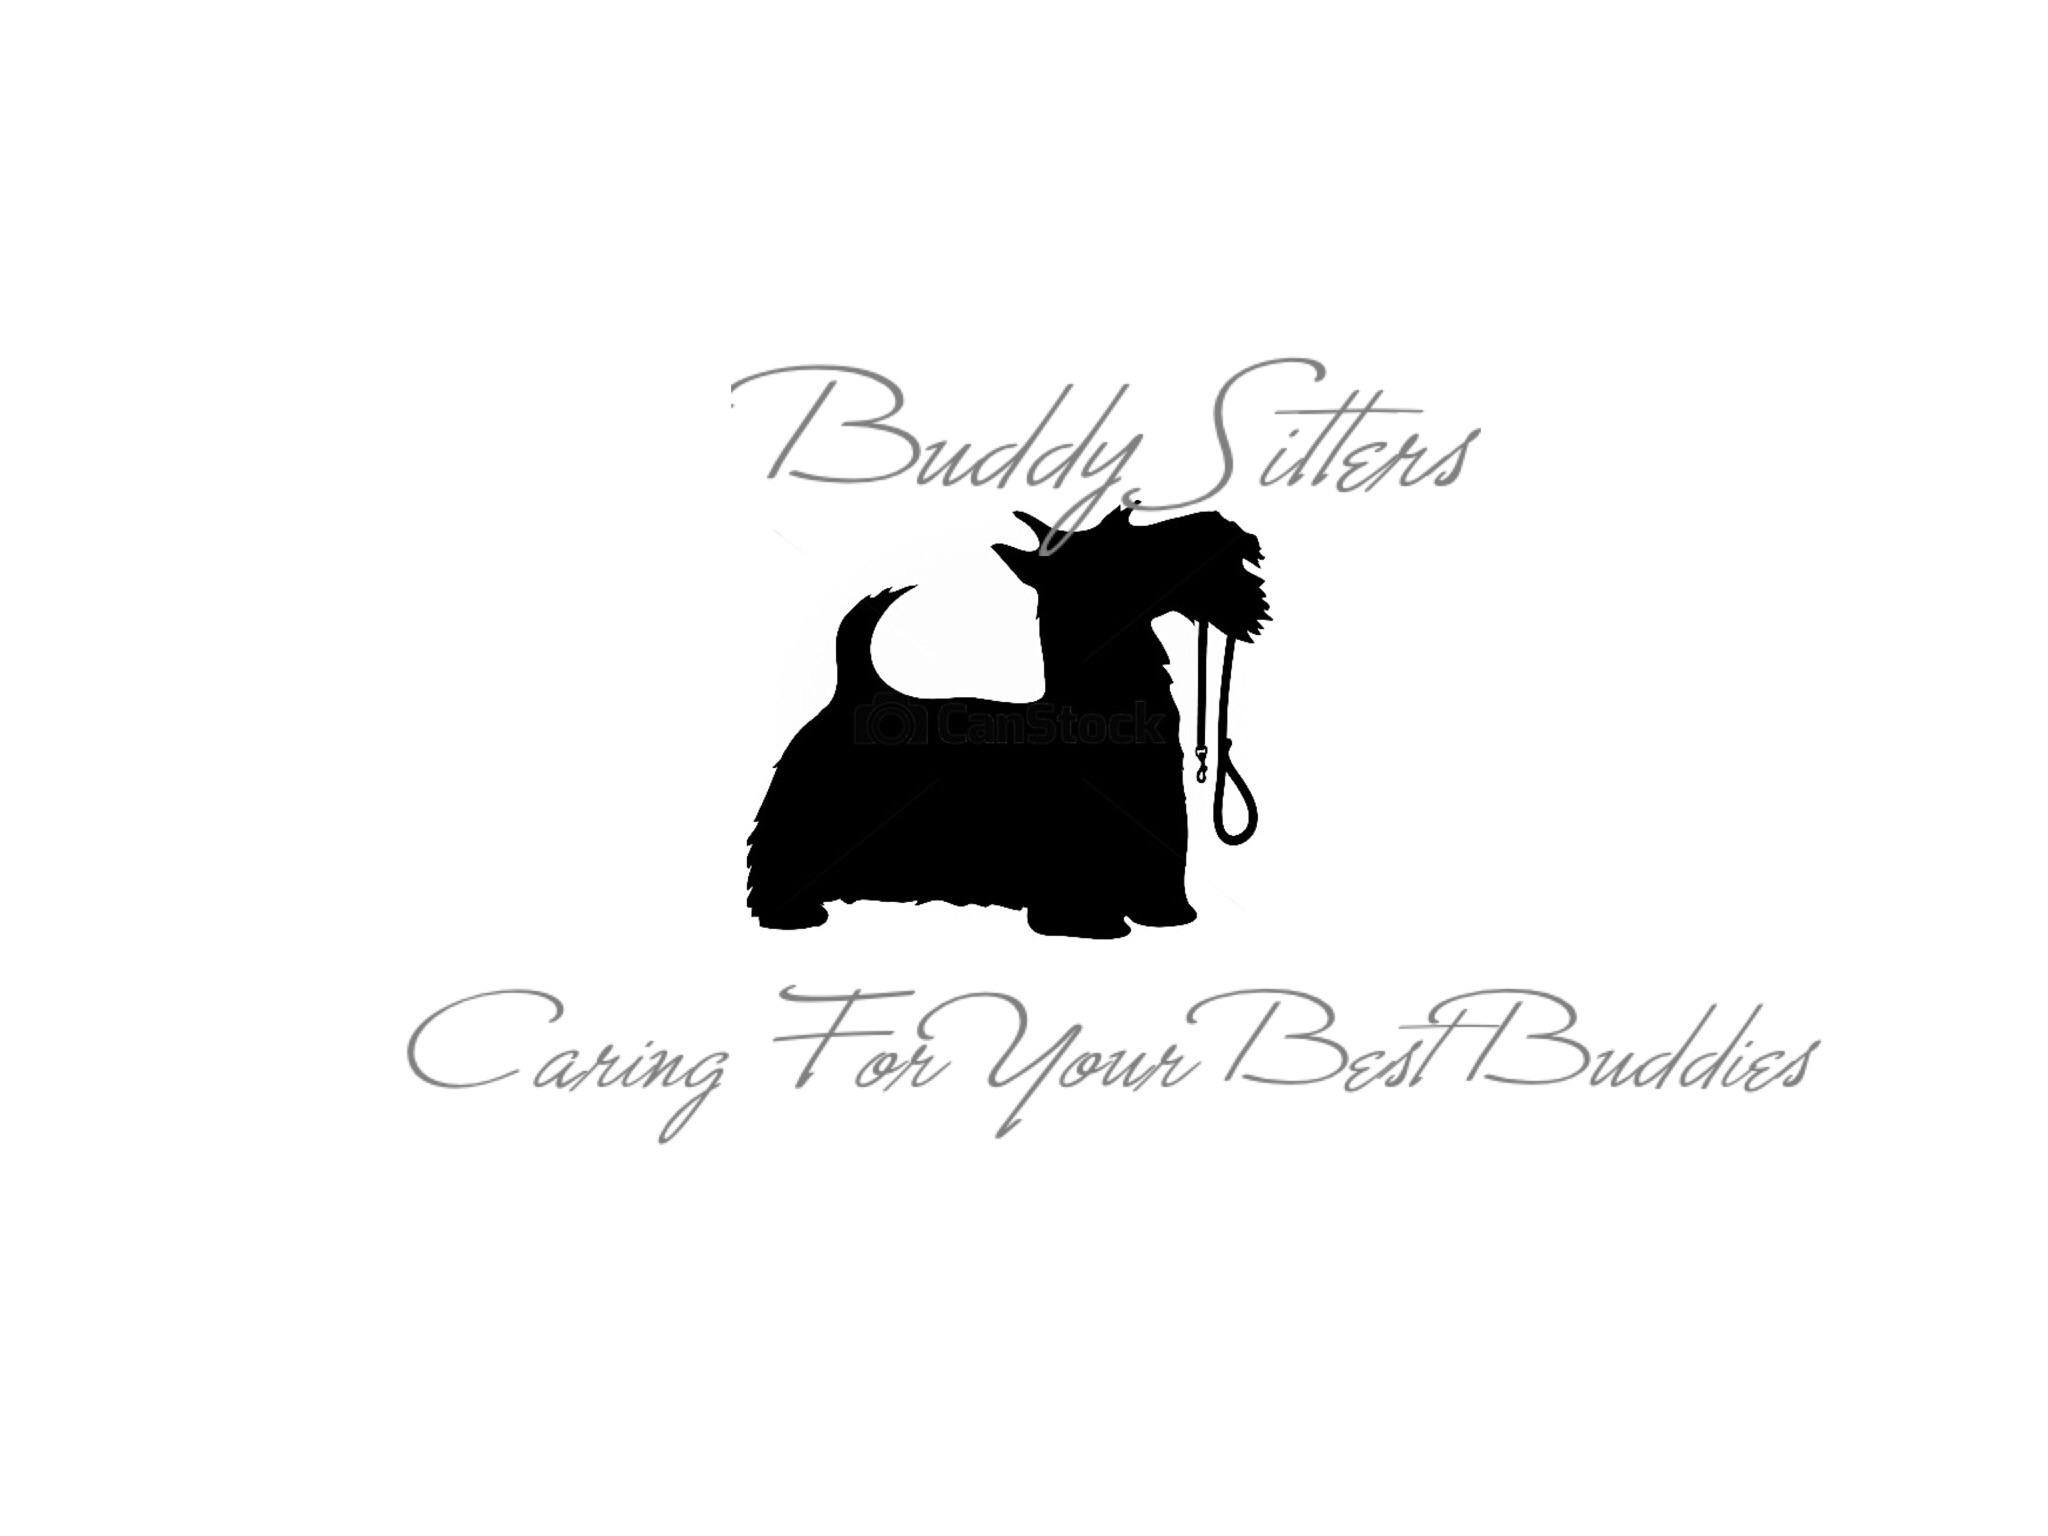 Buddy Sitters logo